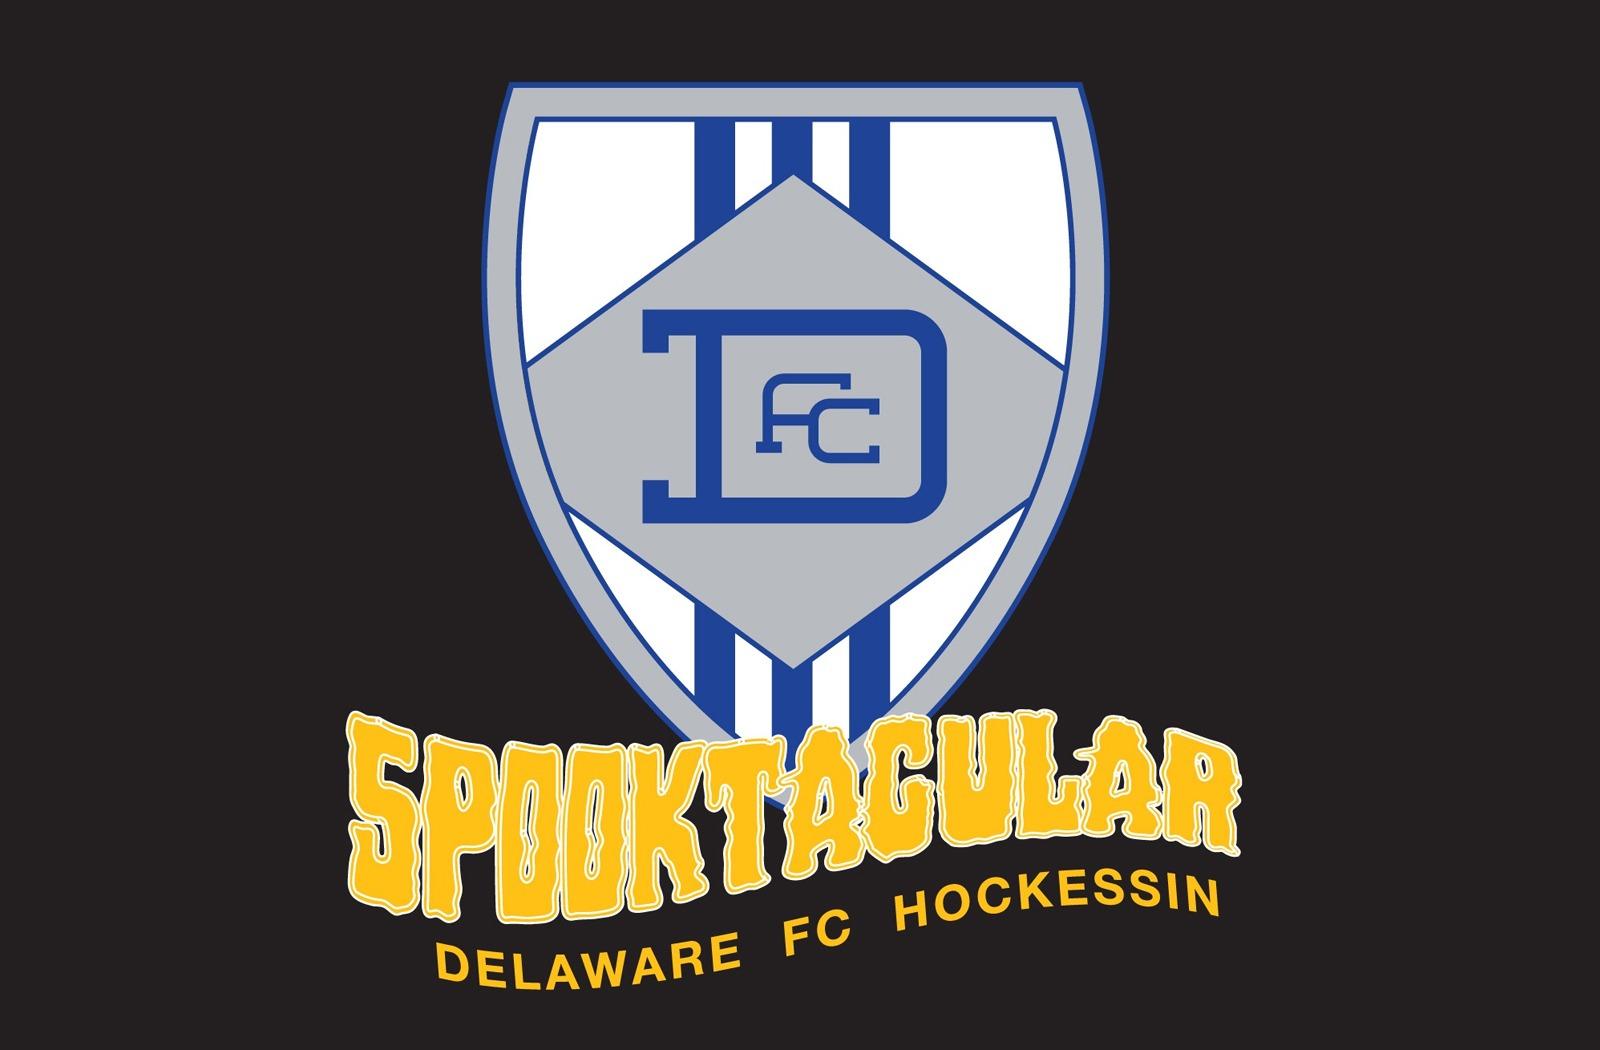 Delaware FC Hockessin 3v3 Tournament - Spooctacular